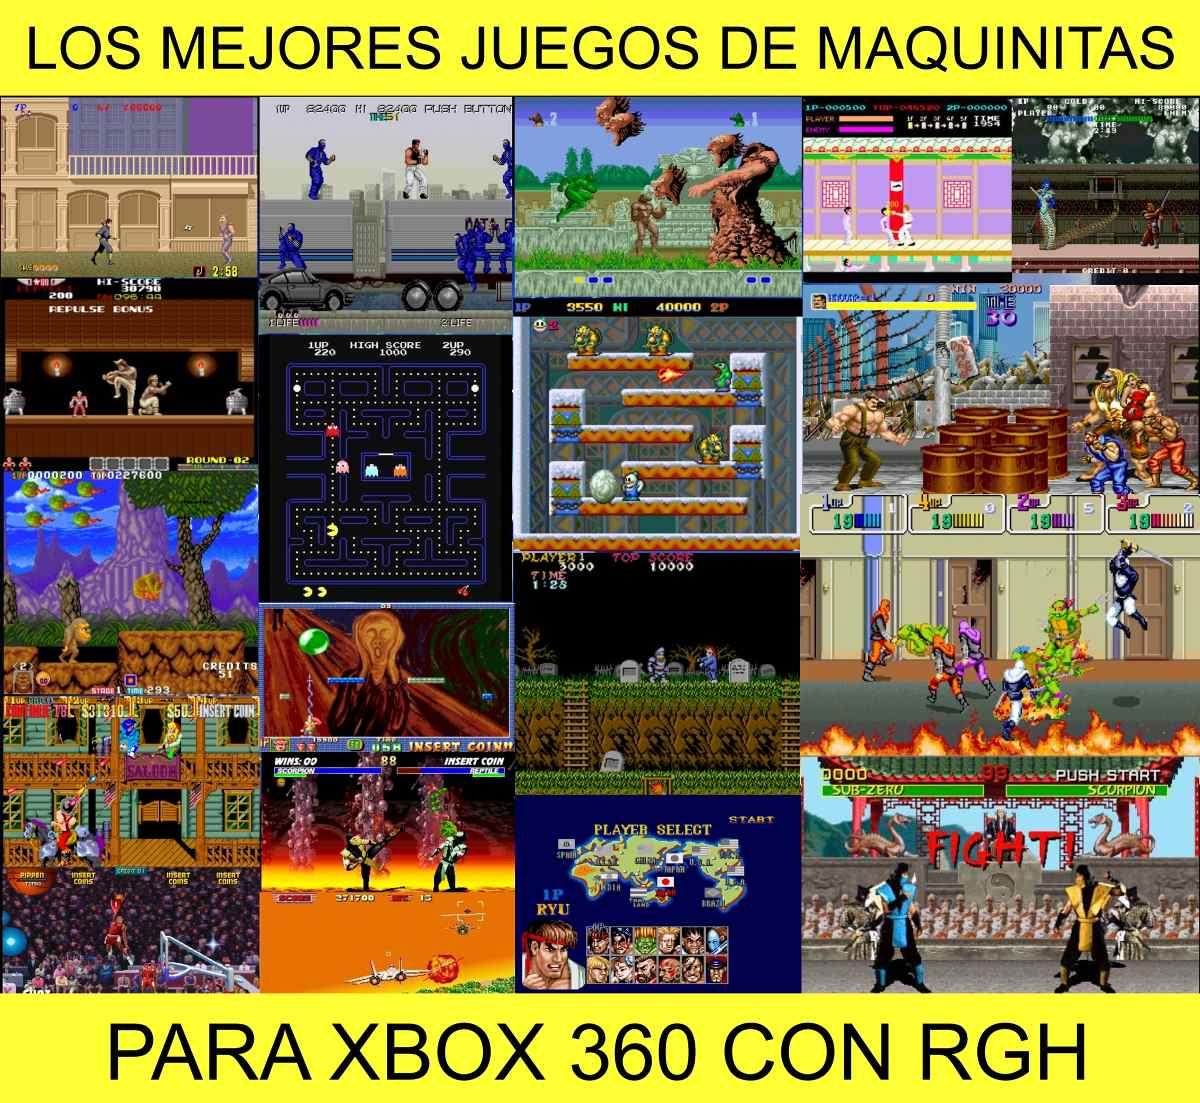 Juegos Xbox Clasico En Xbox 360 Rgh Vinny Oleo Vegetal Info